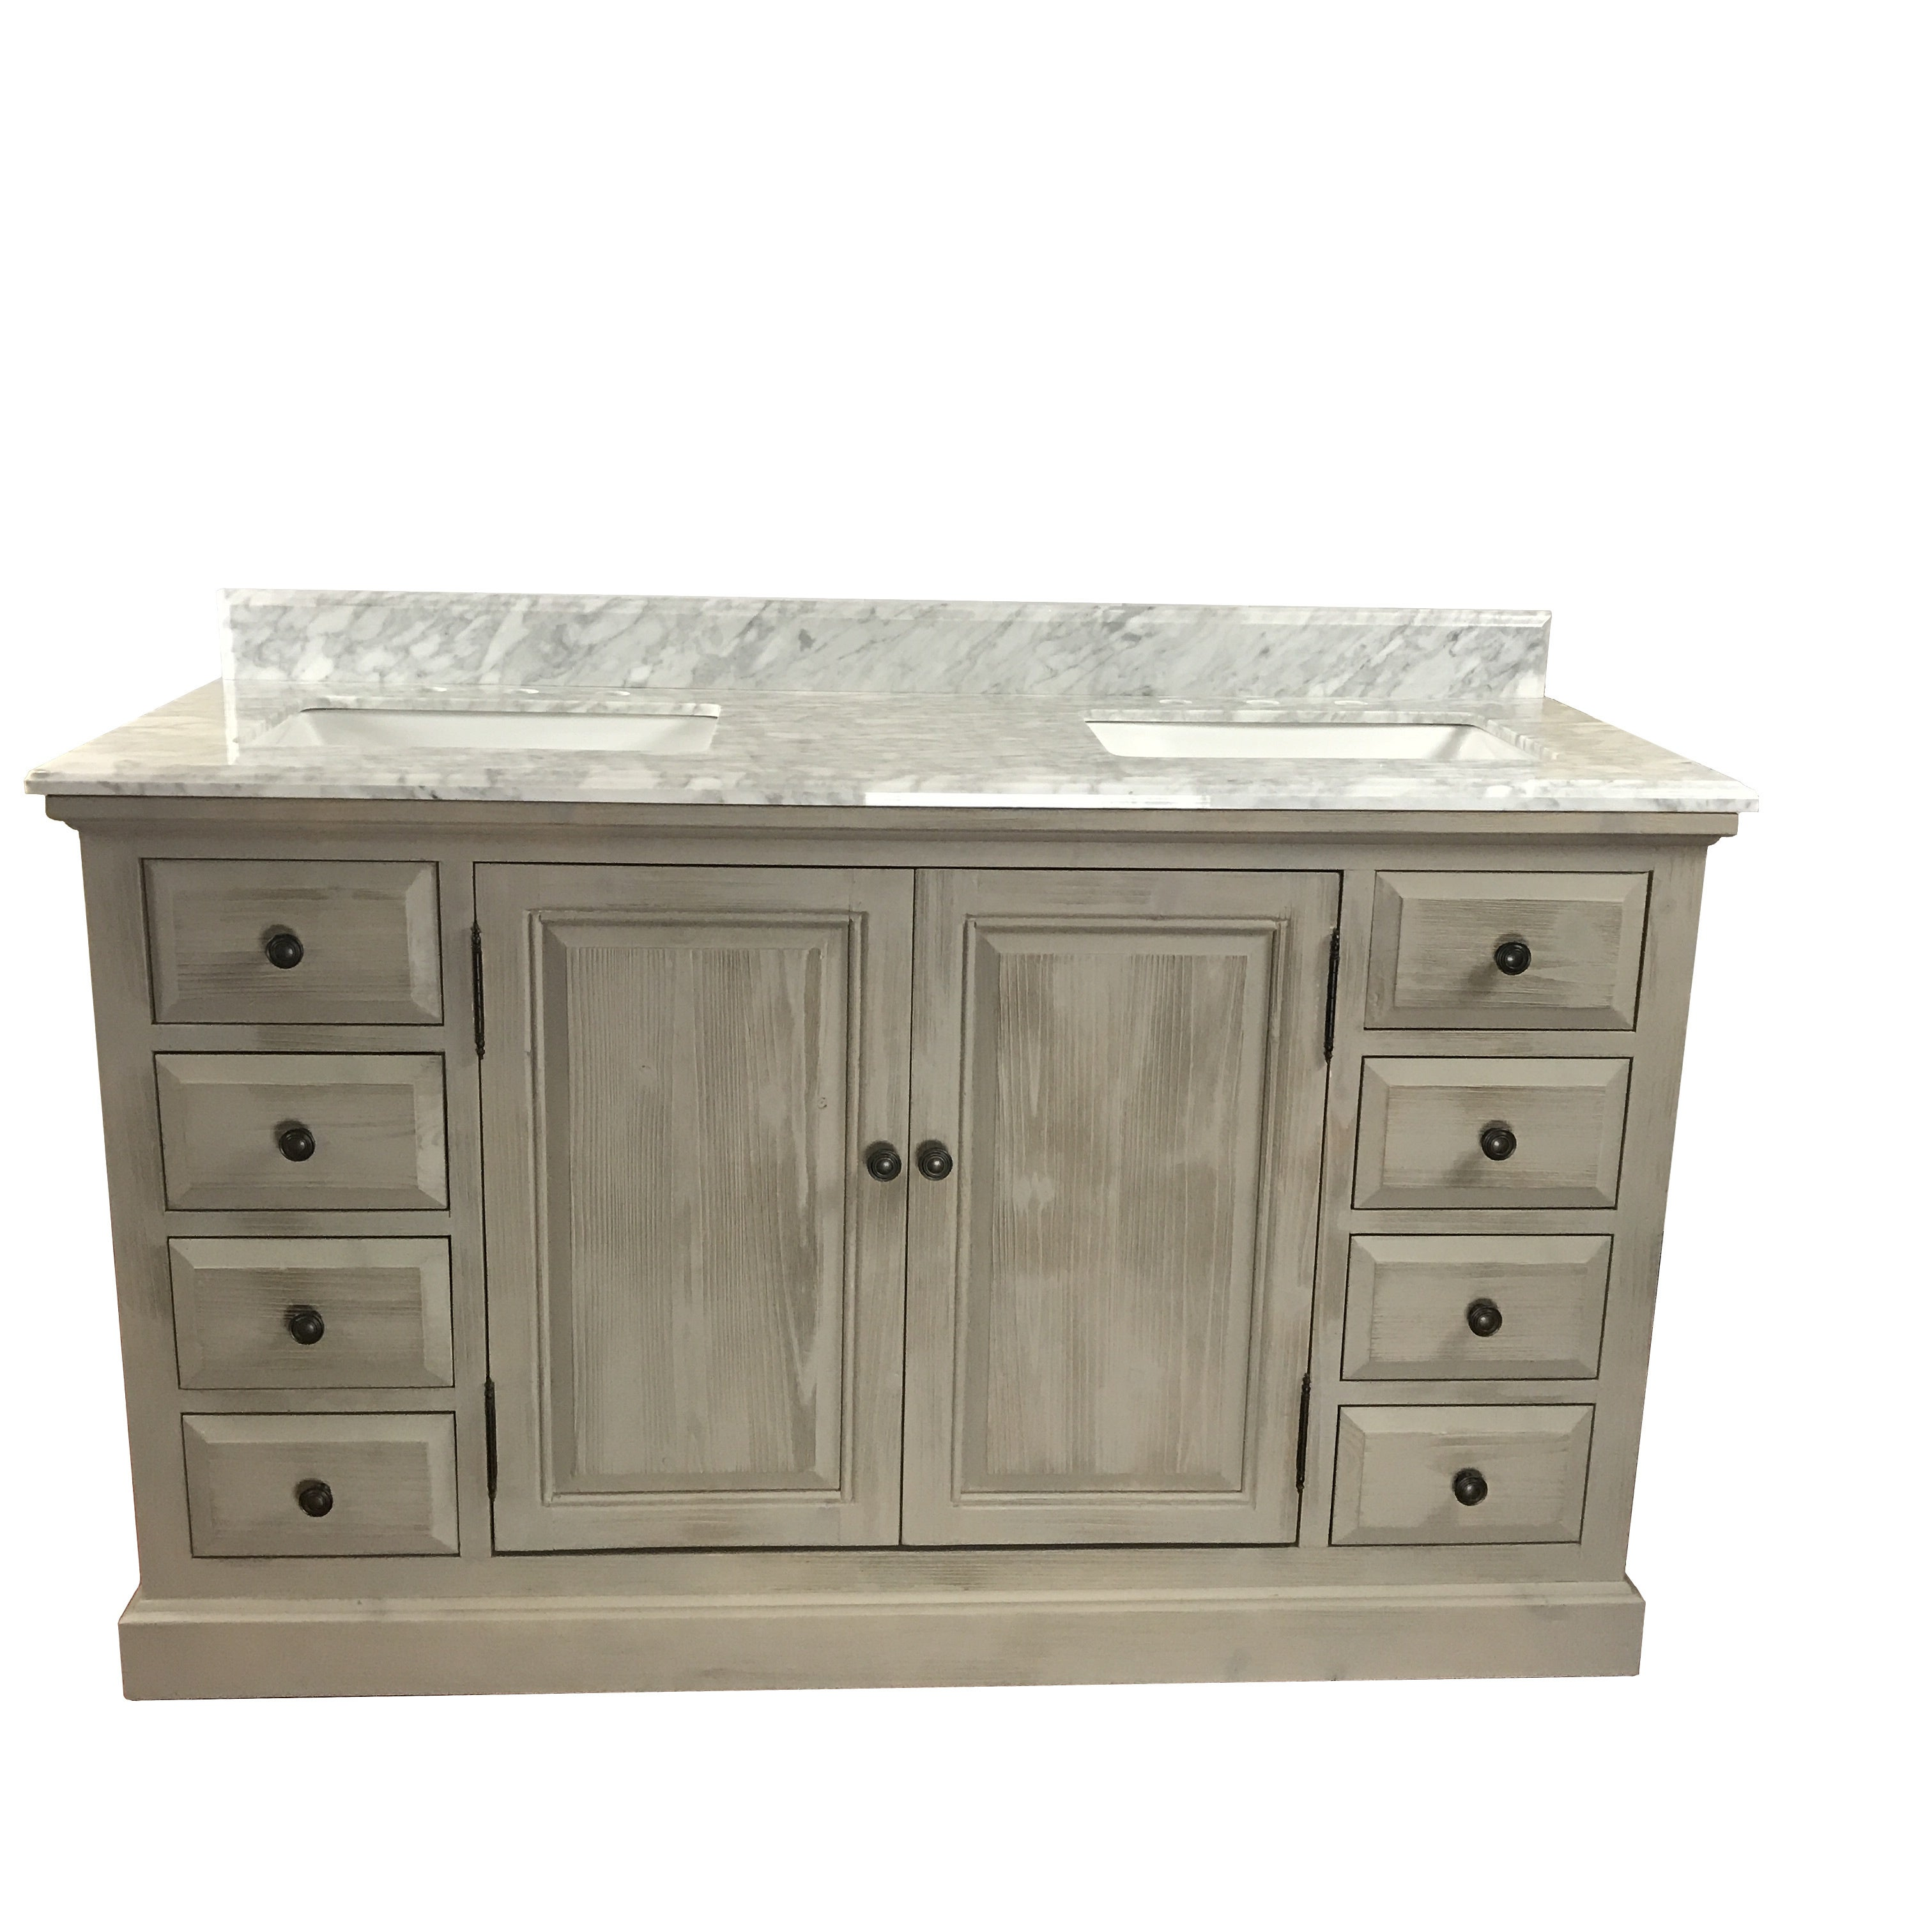 Remarkable Carrera White Mable Top 60 Inch Single Sink Bathroom Vanity Interior Design Ideas Gentotryabchikinfo